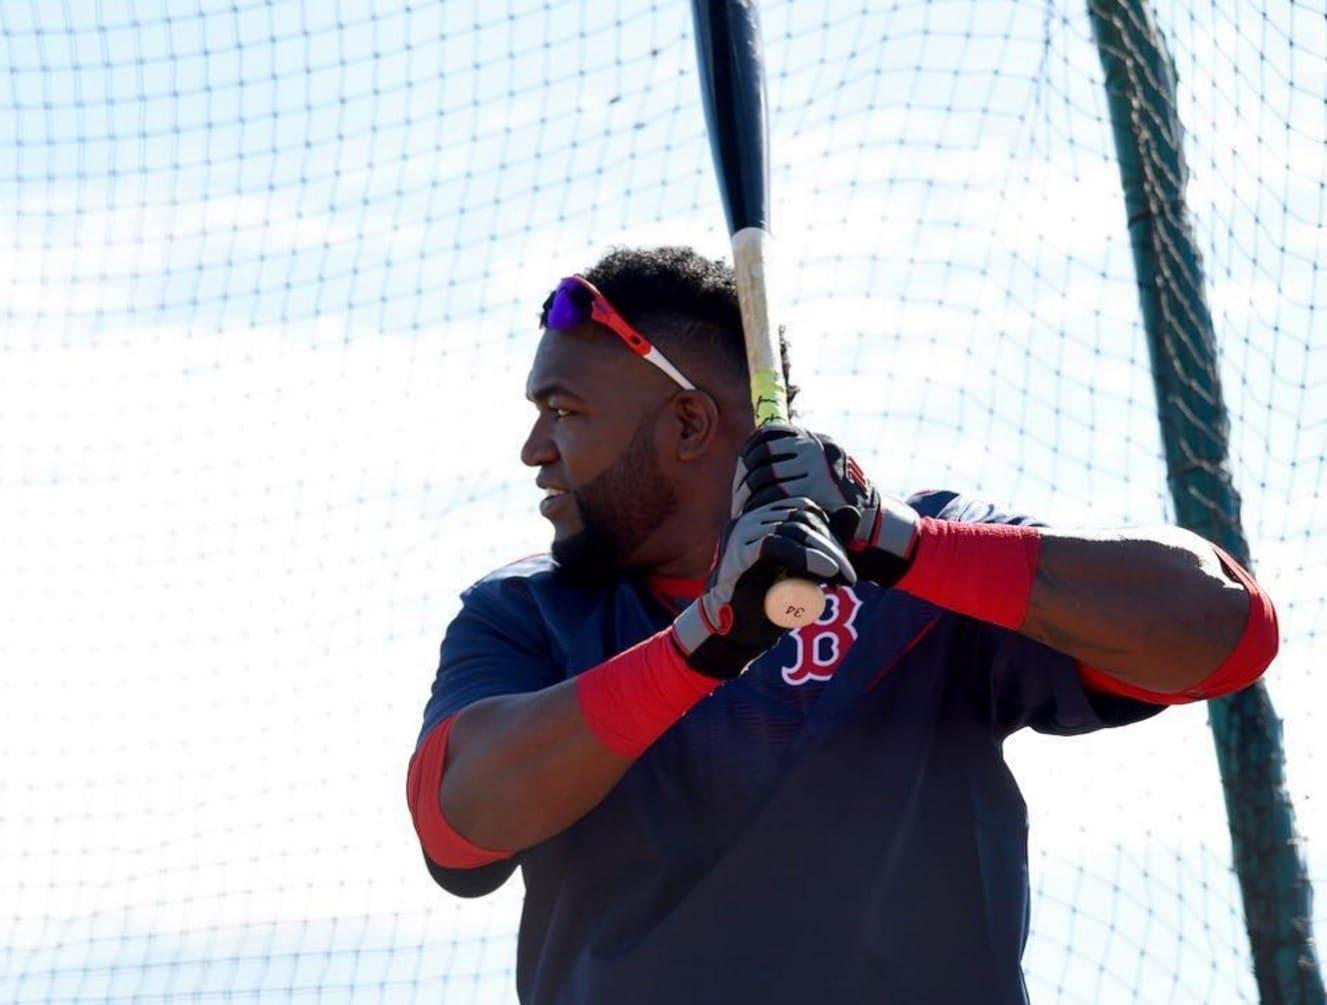 David Ortiz, rebatedor designado do Red Sox